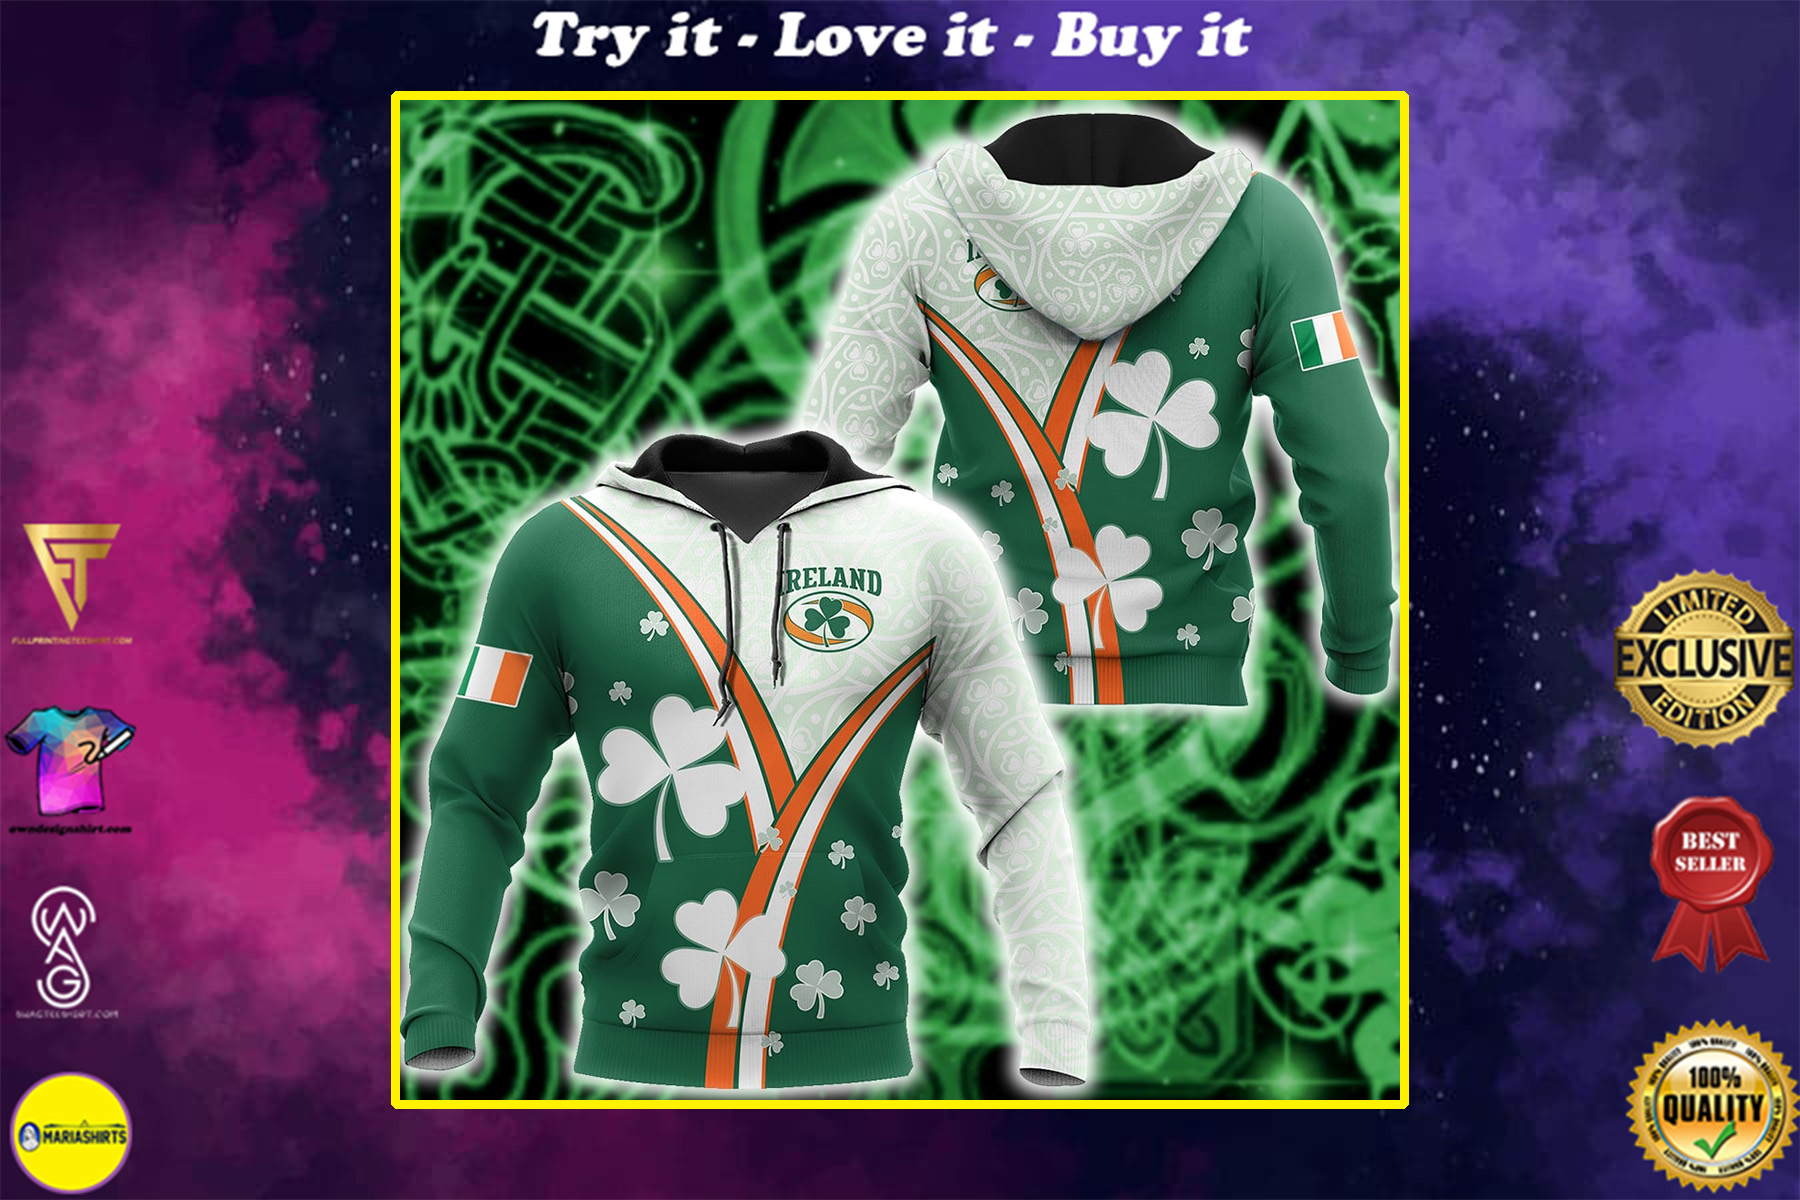 saint patricks day ireland flag full printing shirt